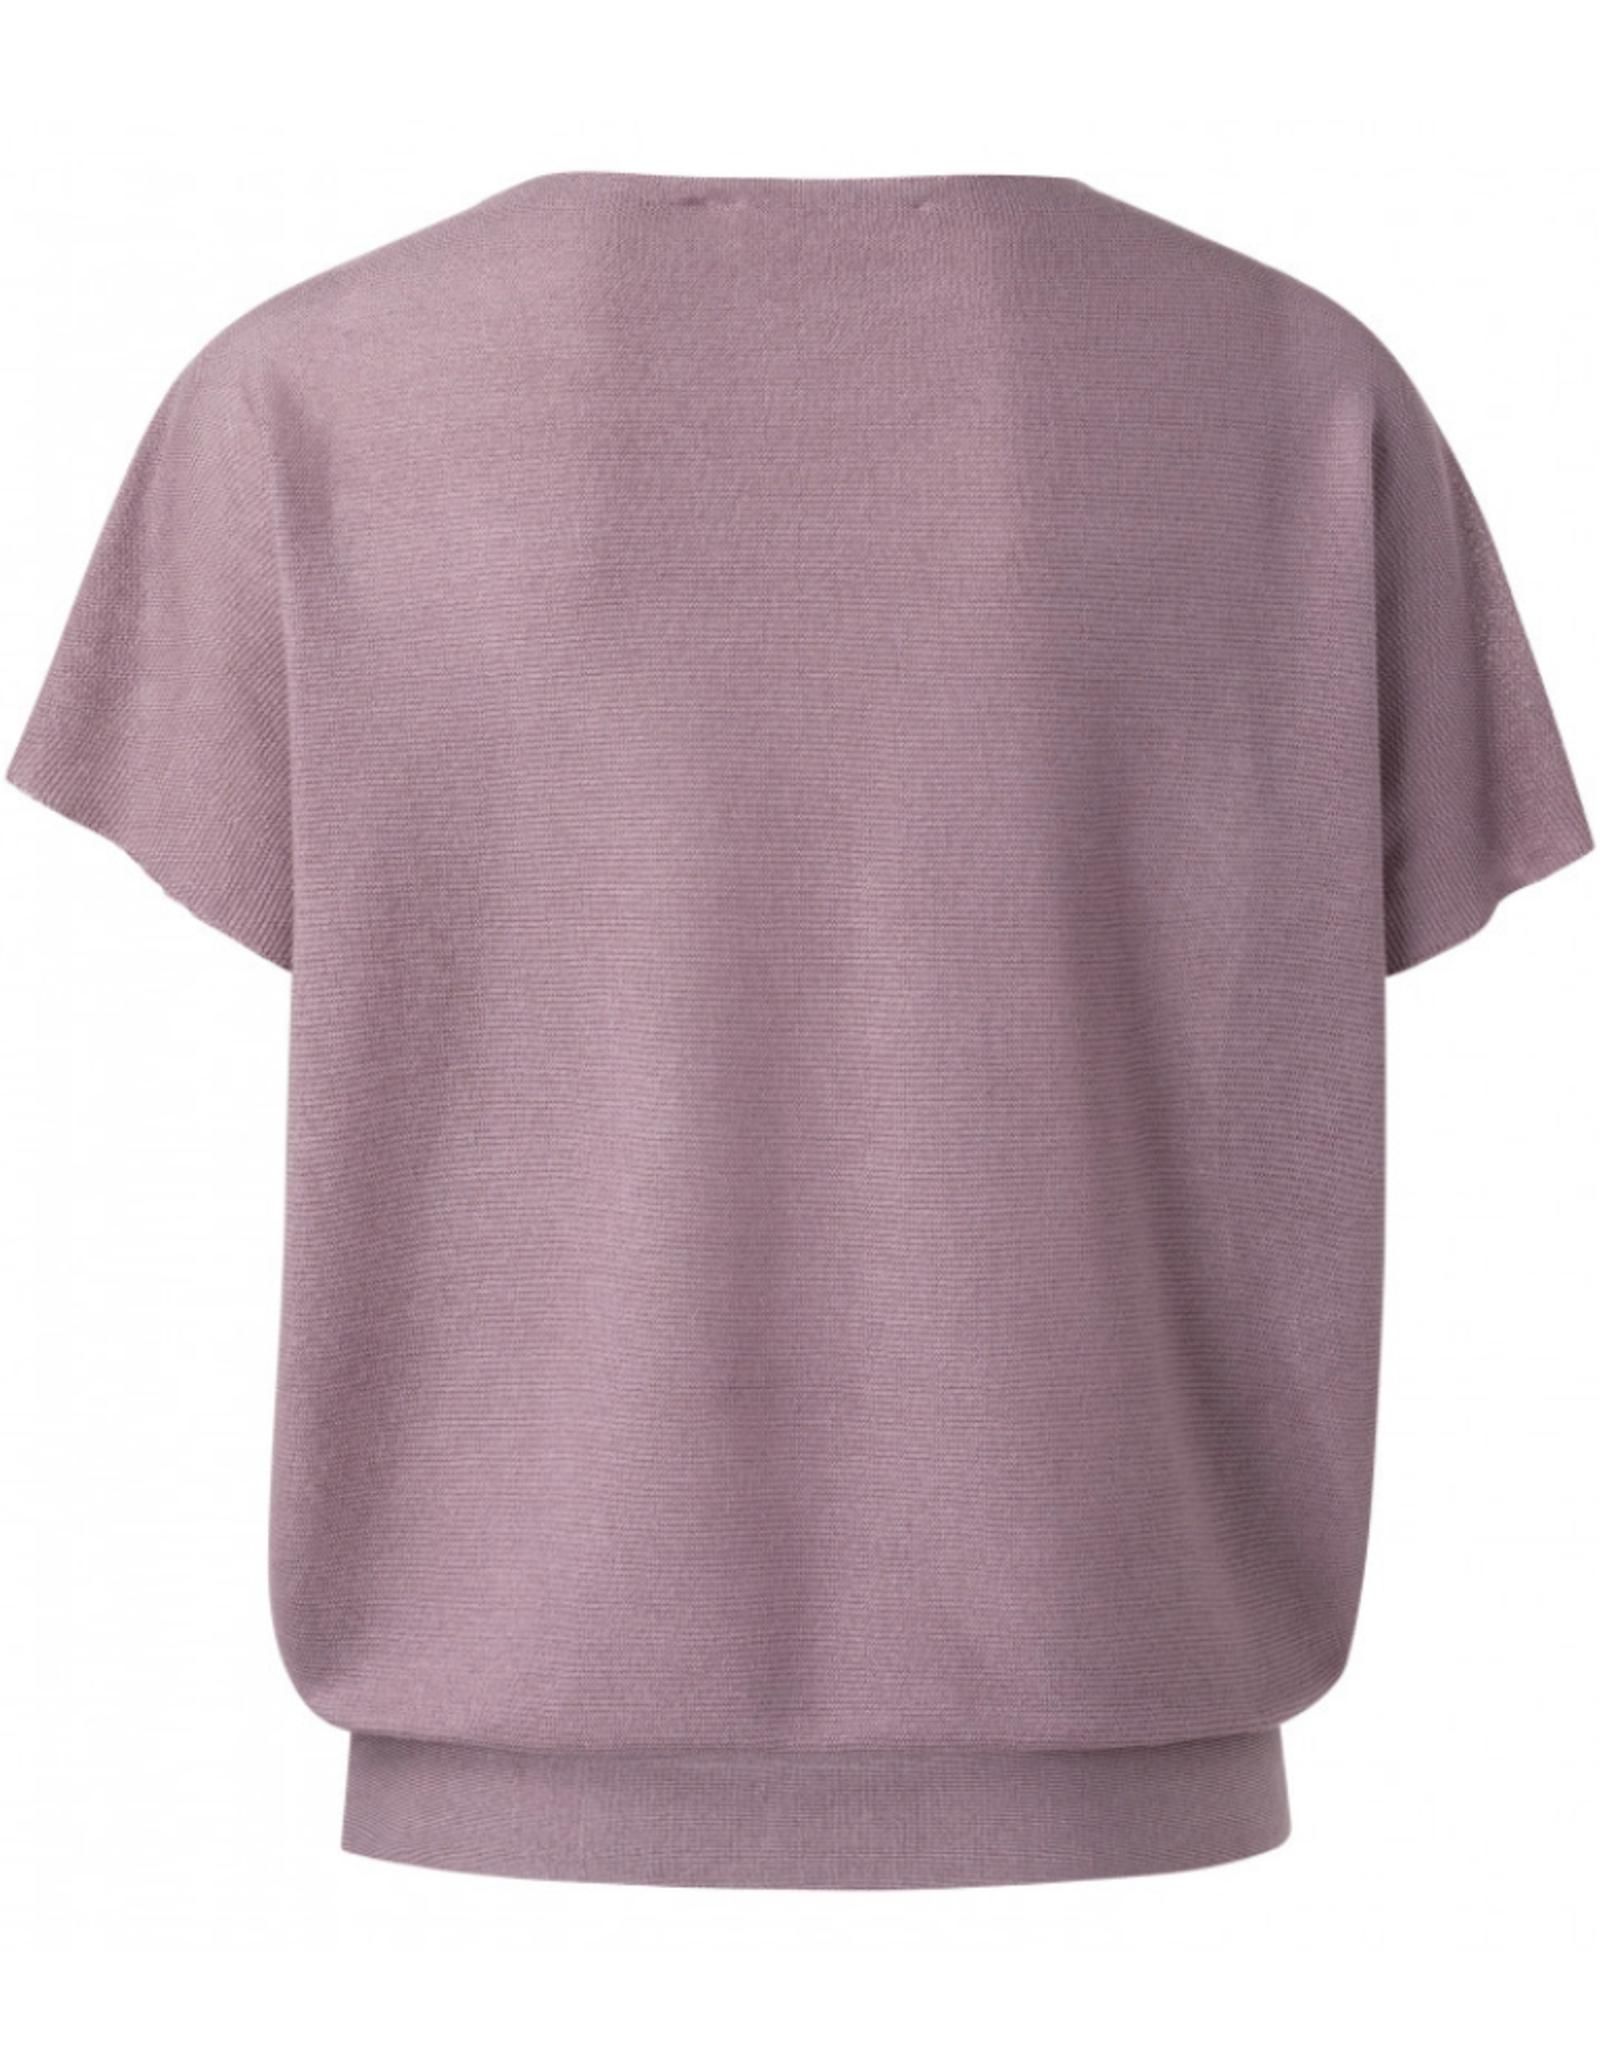 Yaya Silk Blend Lilac Sweater